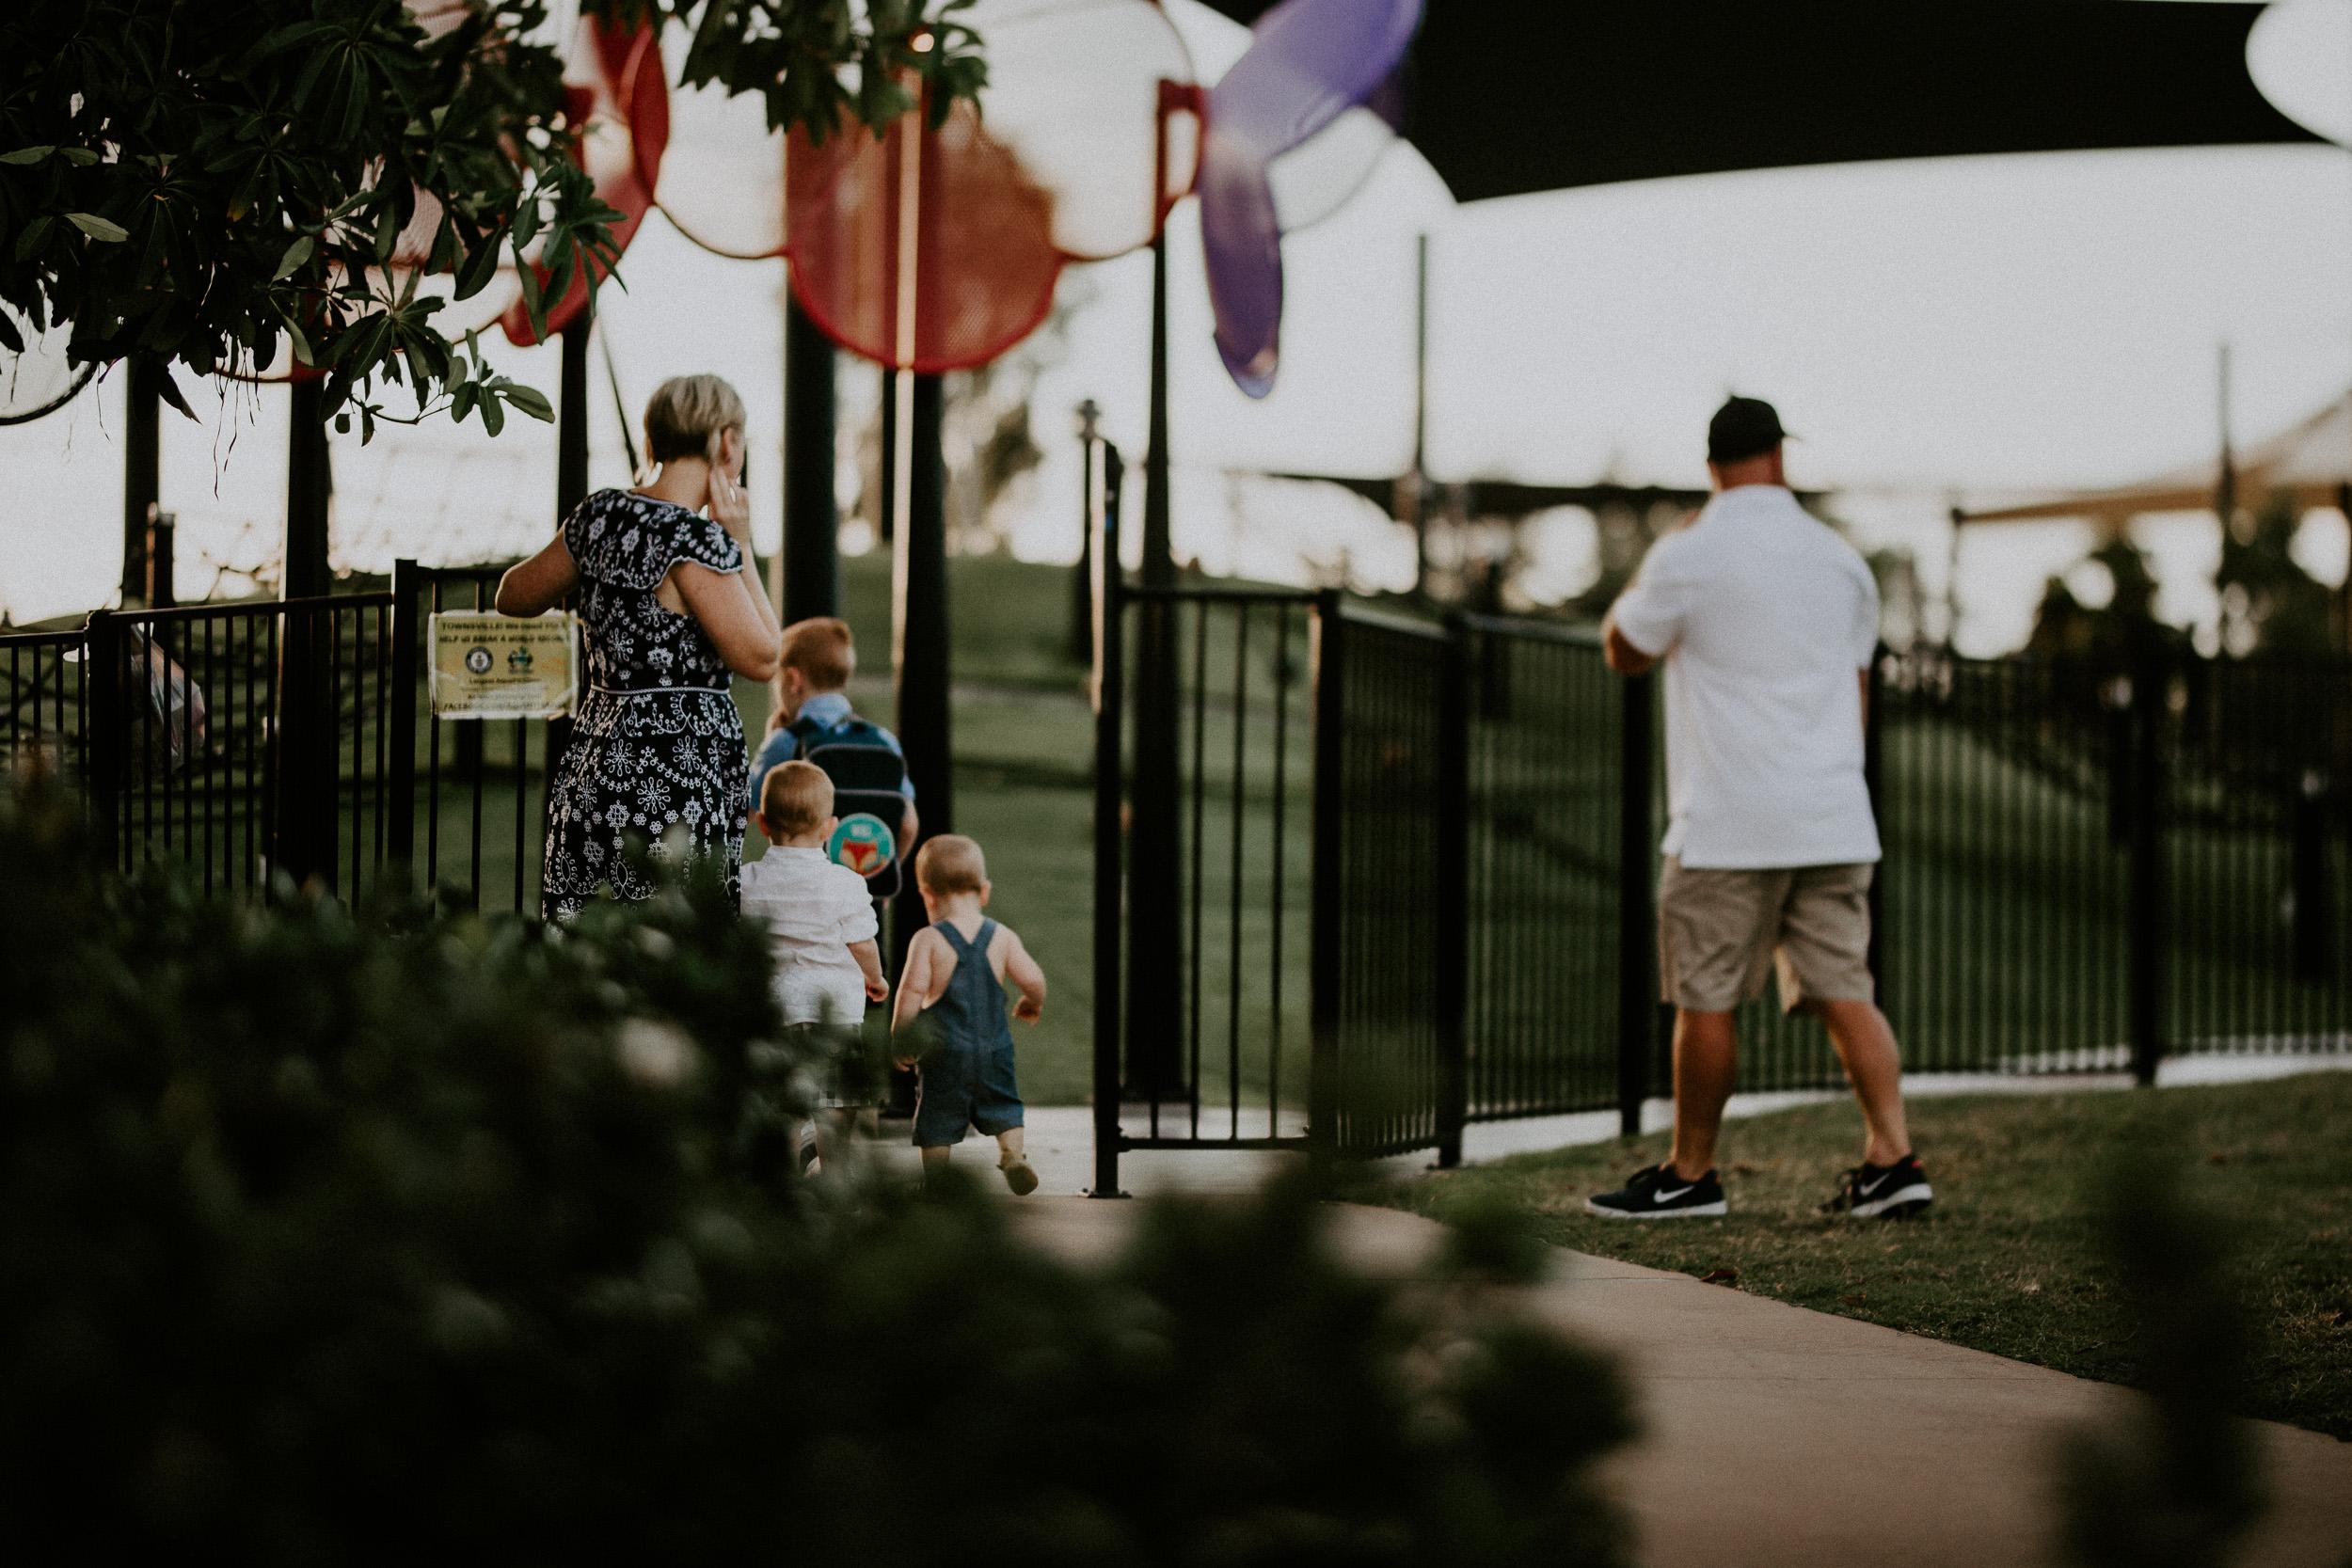 outdoor-family-lifetsyle-townsville-photographer-59.jpg